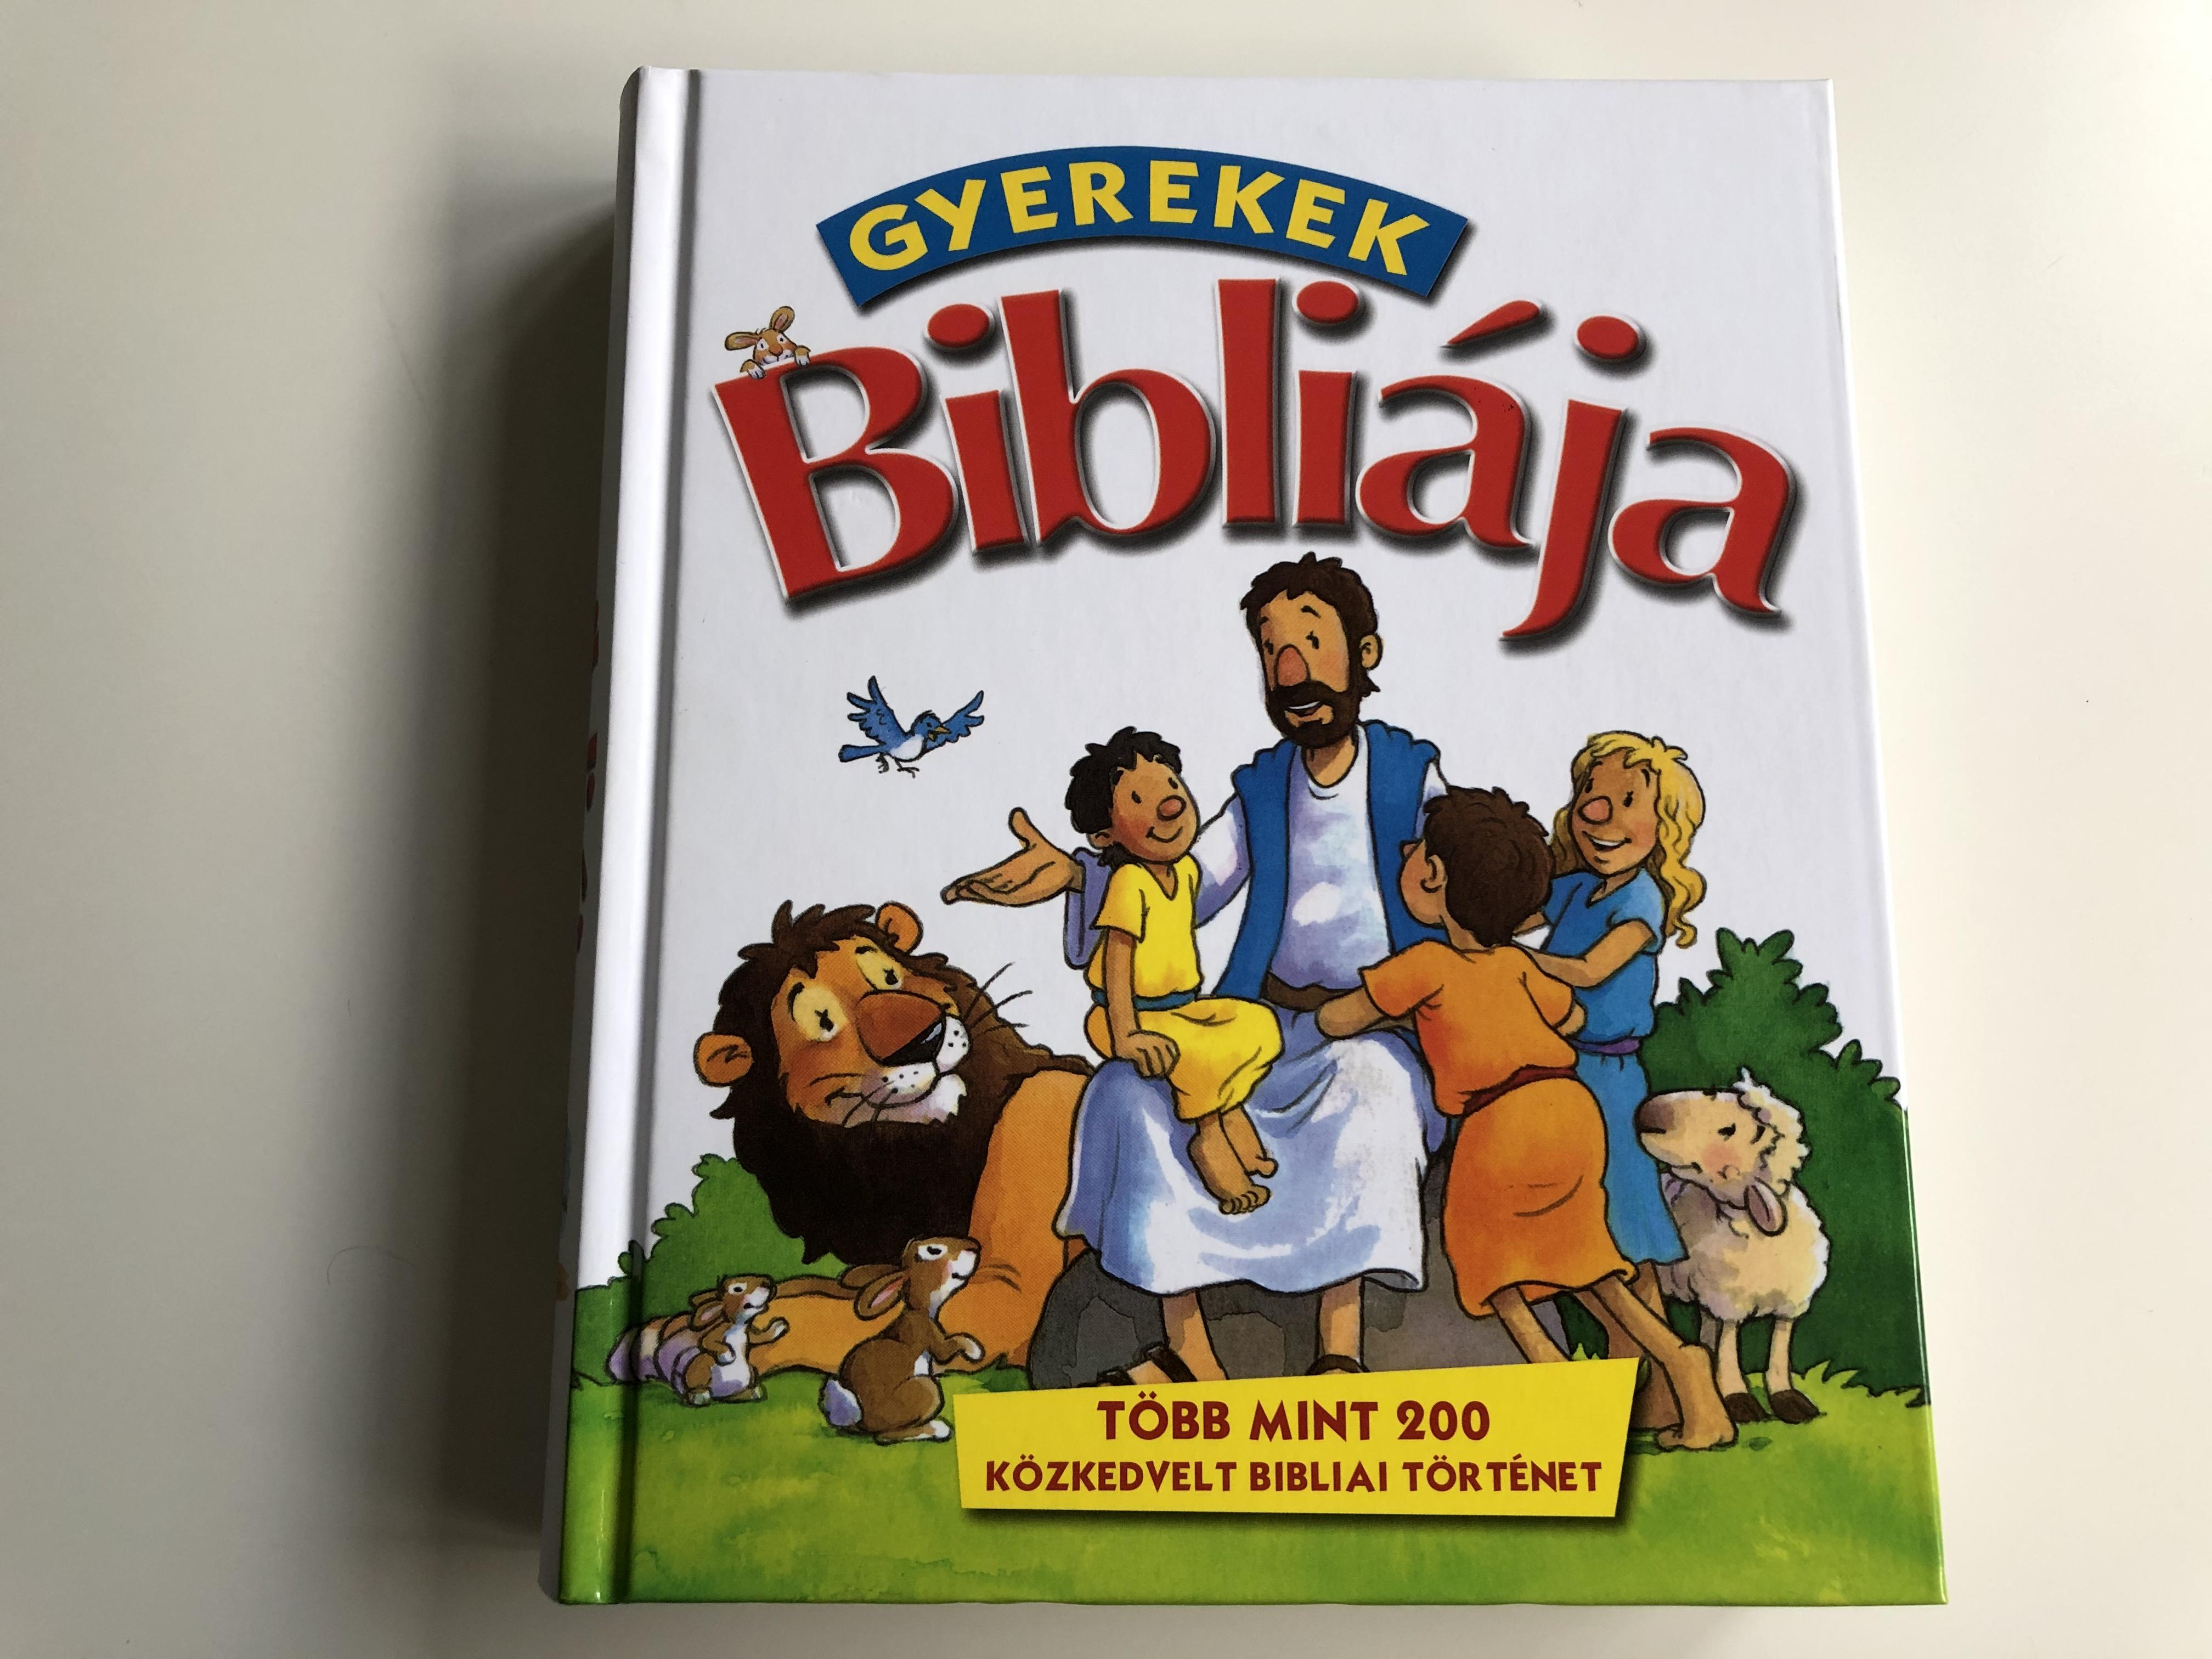 gyerekek-bibli-ja-hungarian-edition-of-read-share-bible-by-gwen-ellis-1.jpg